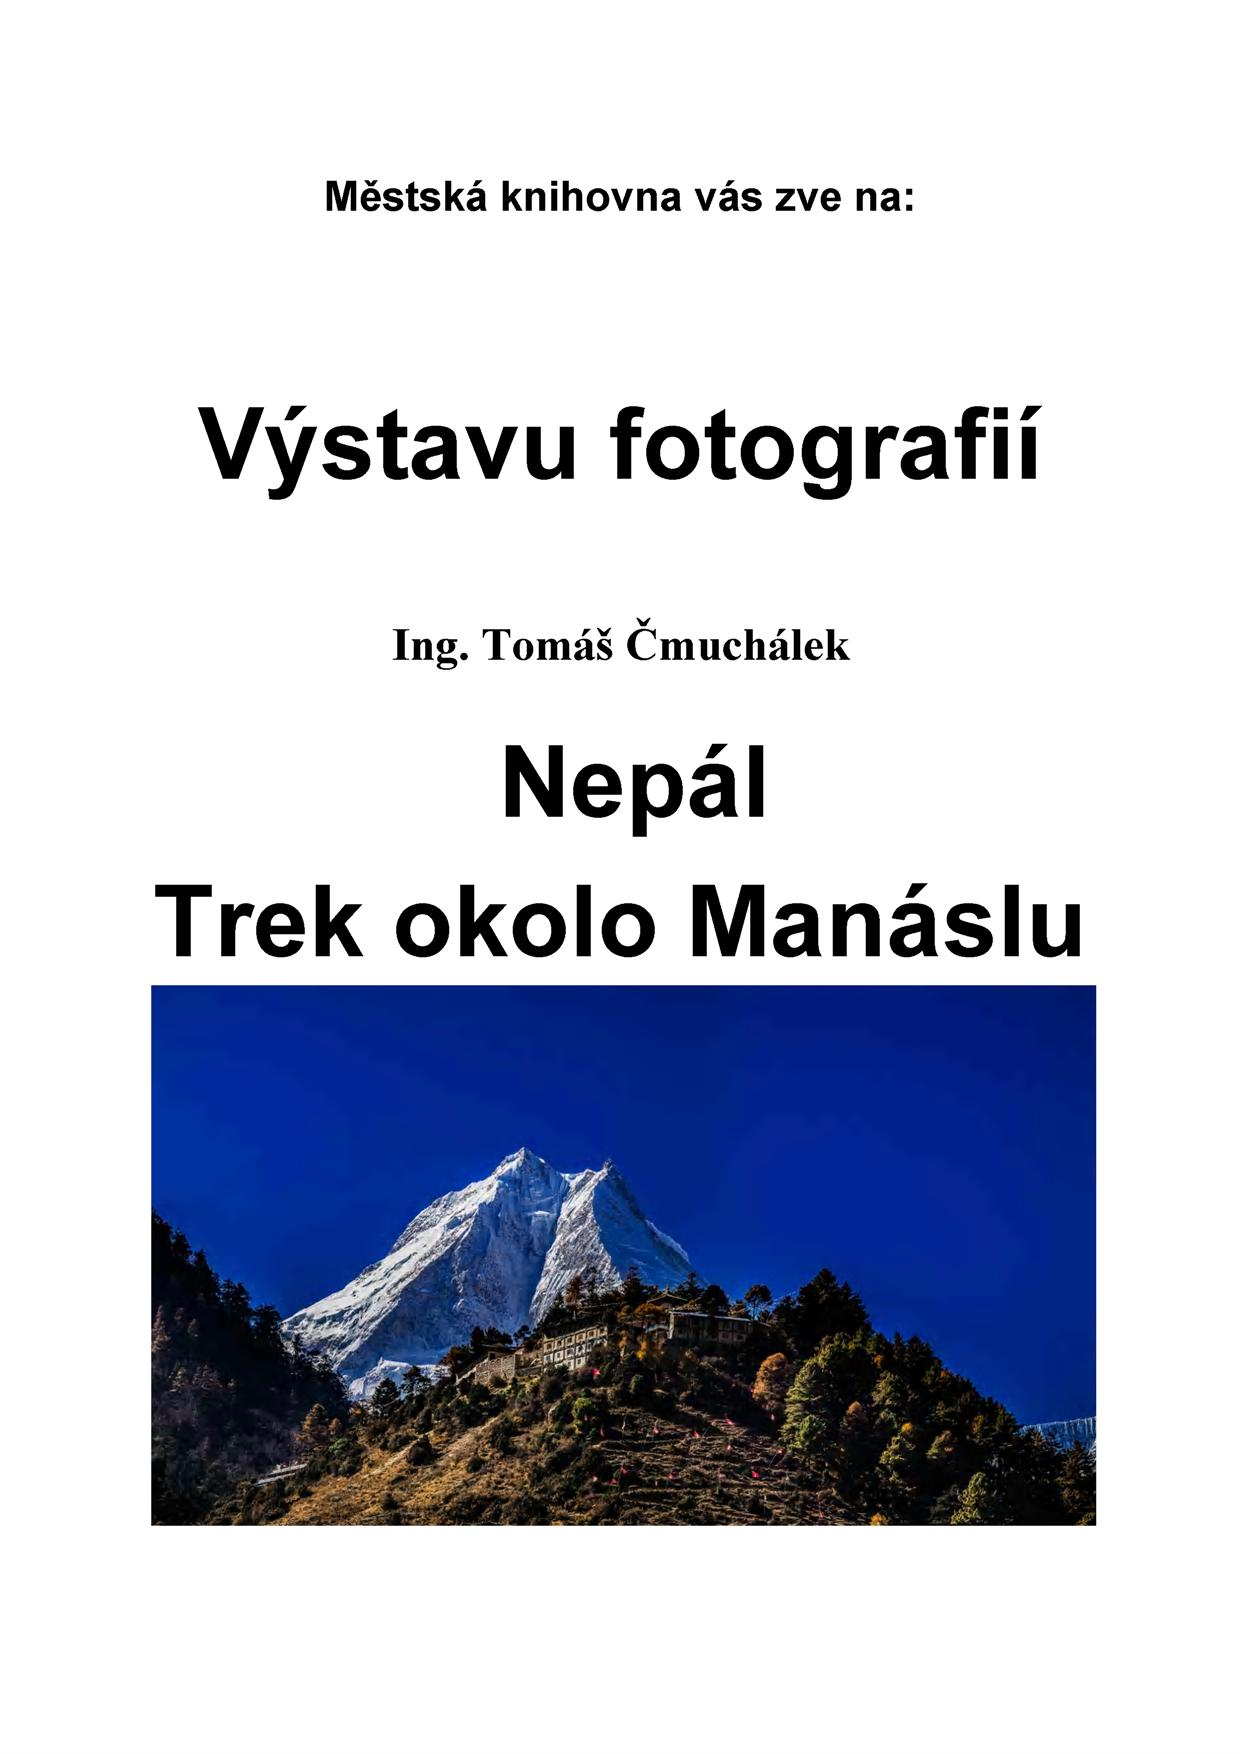 OBRÁZEK : cmuchalek_na_fb.jpg